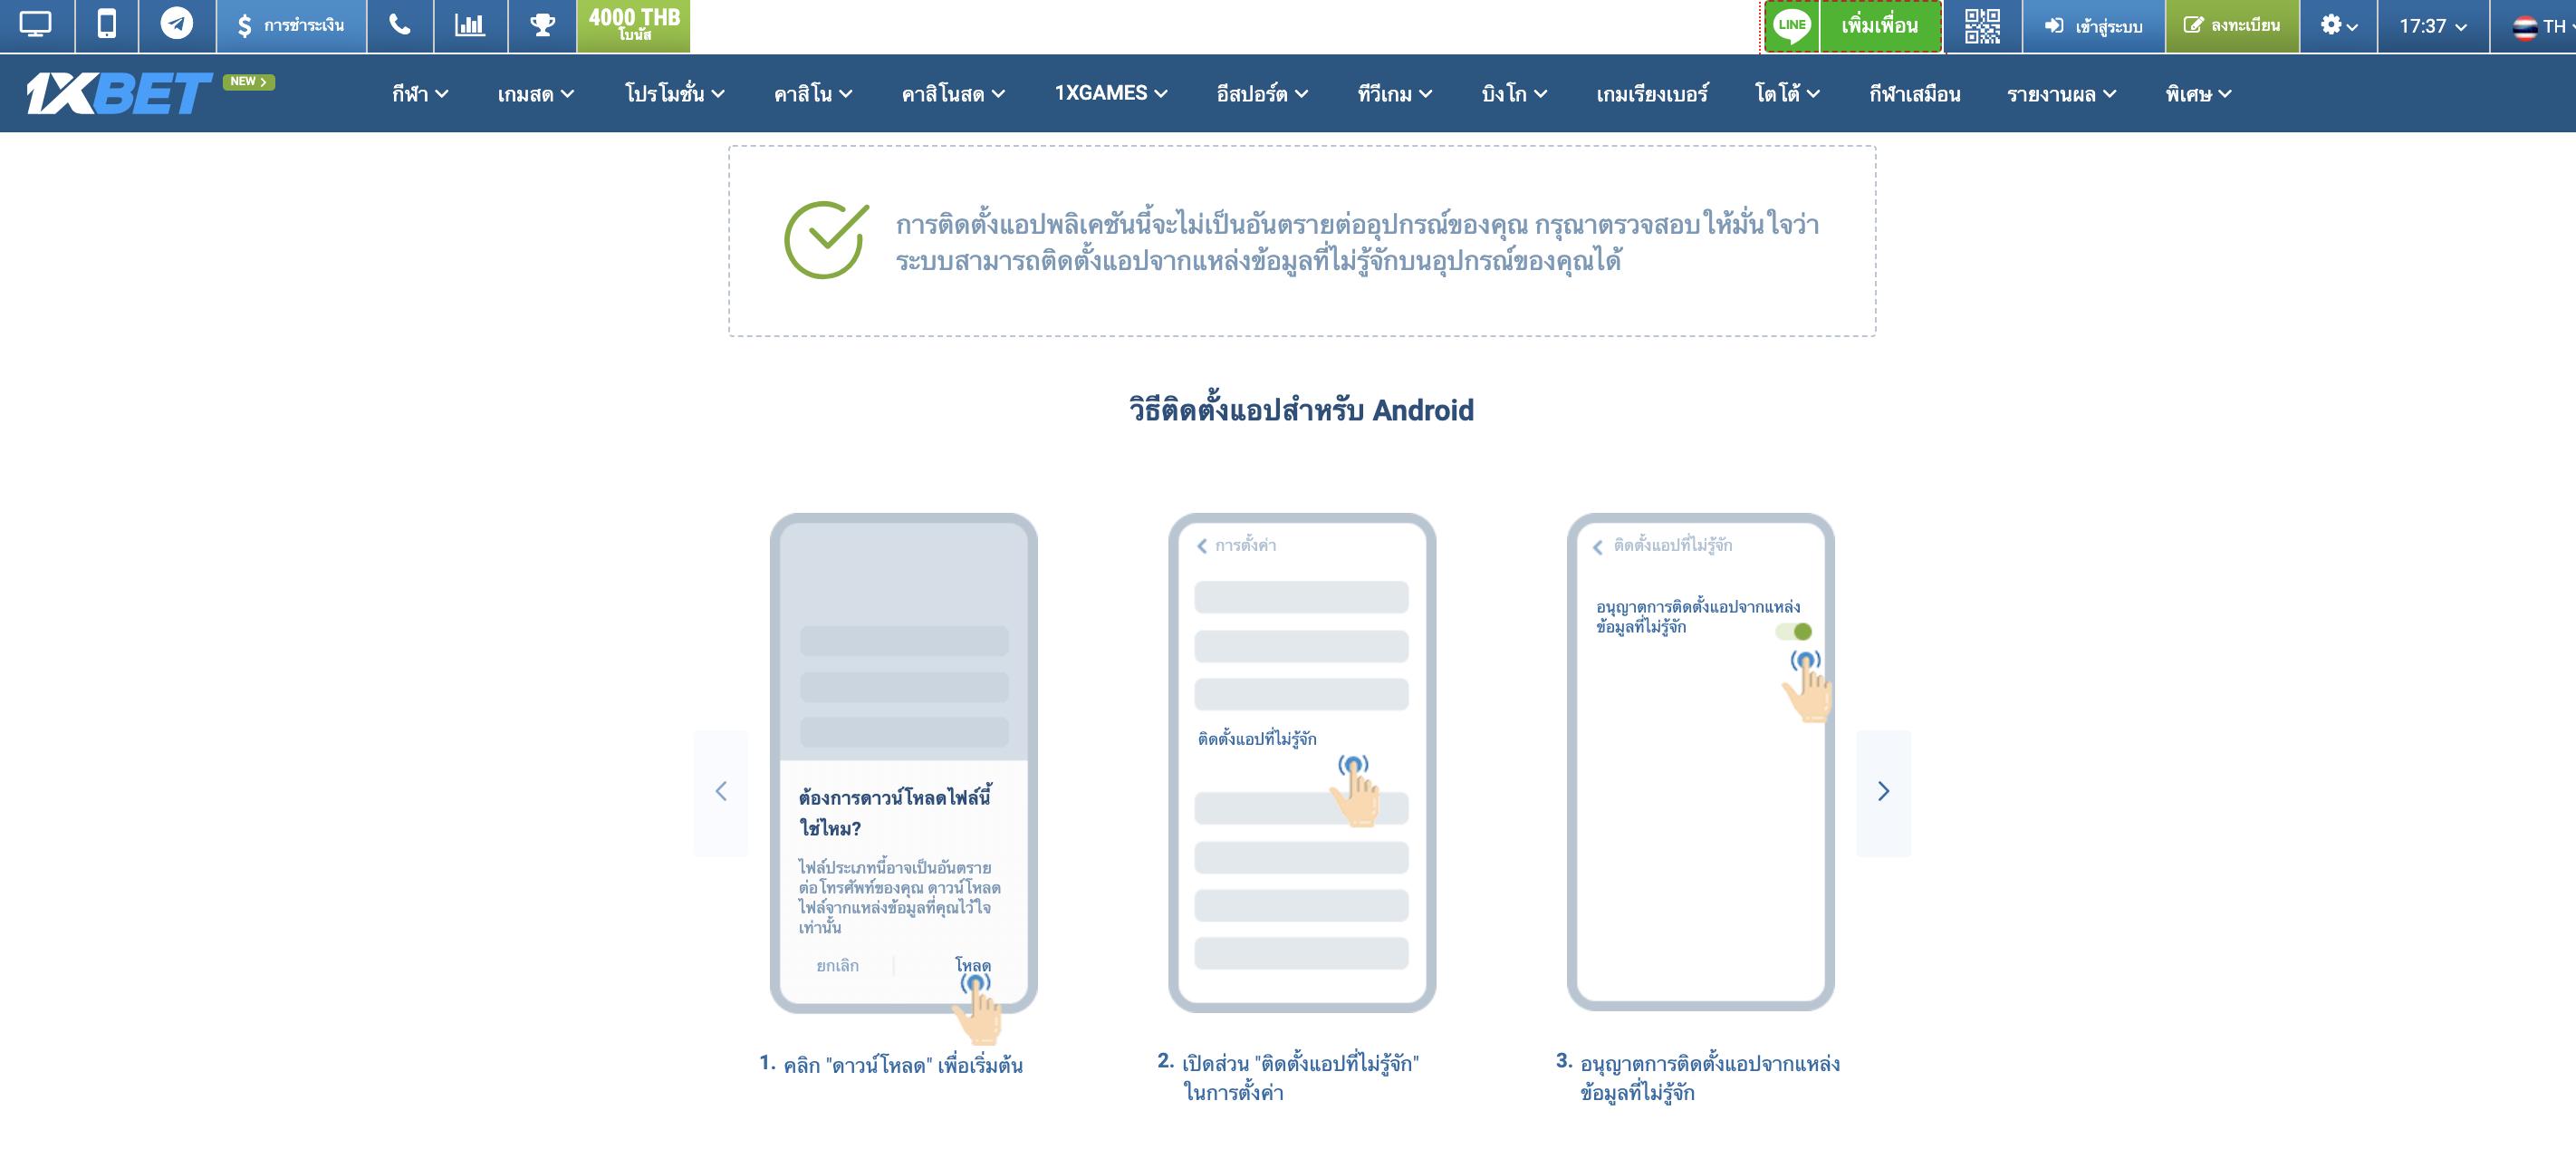 1xbet Android - แอพมือถือสำหรับแอนดรอยด์